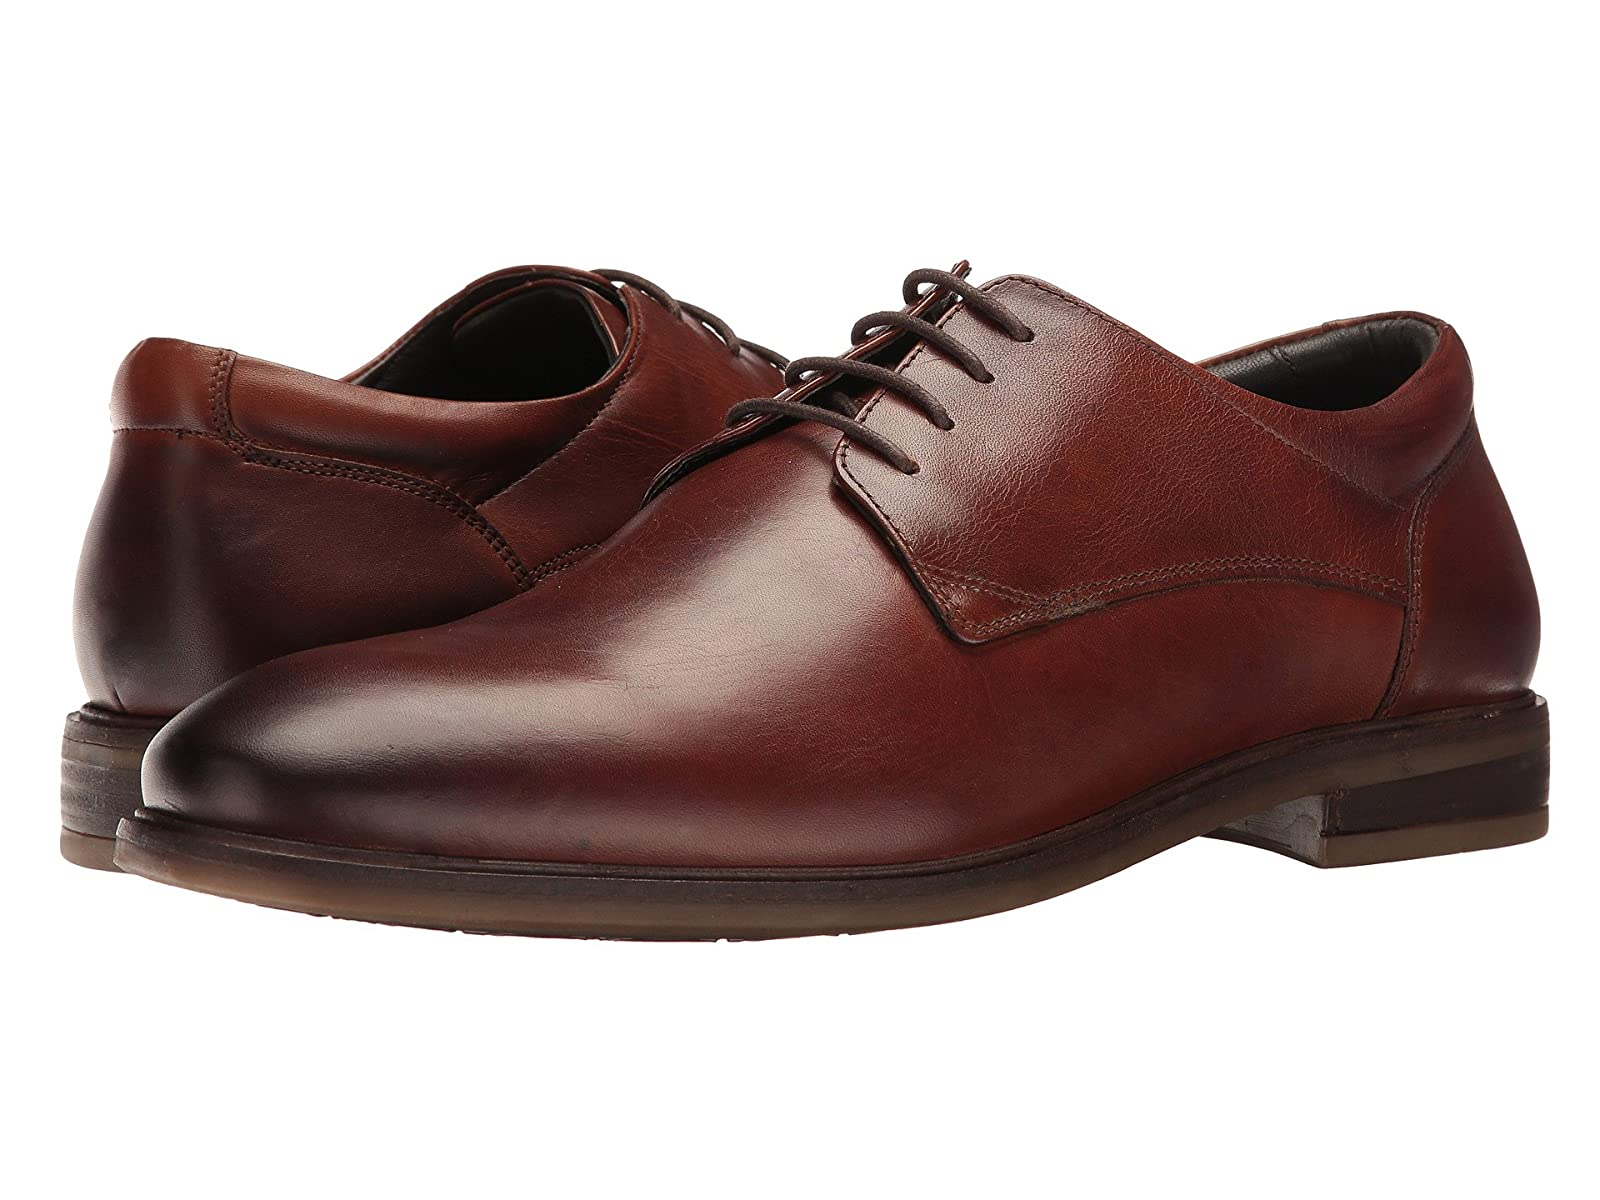 Josef Seibel Myles 07Atmospheric grades have affordable shoes